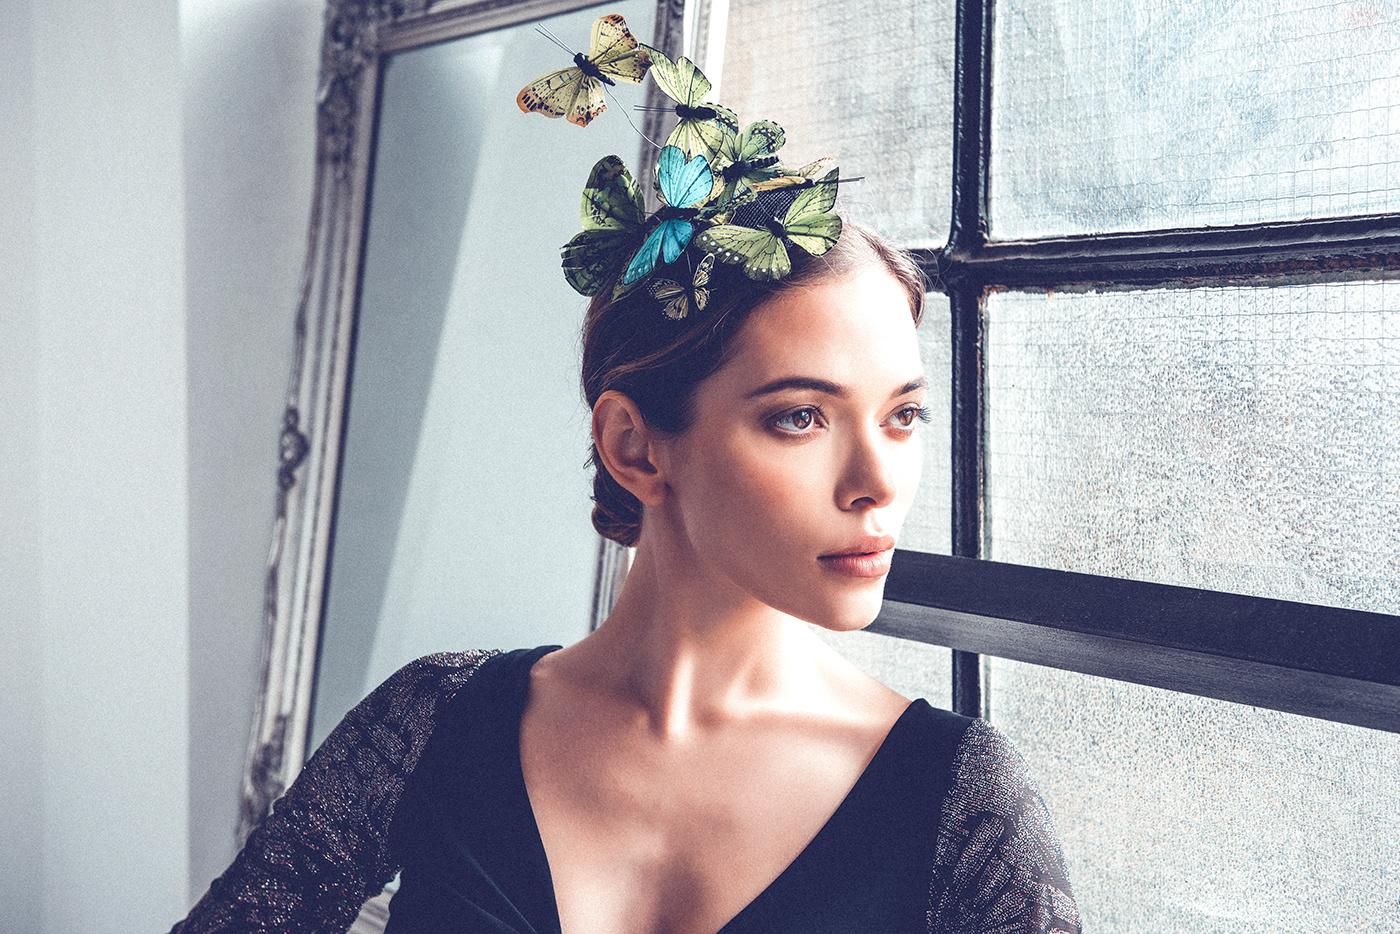 beauty butterfly editorial Fashion  fashion photography Fotografia moda model Photography  portrait